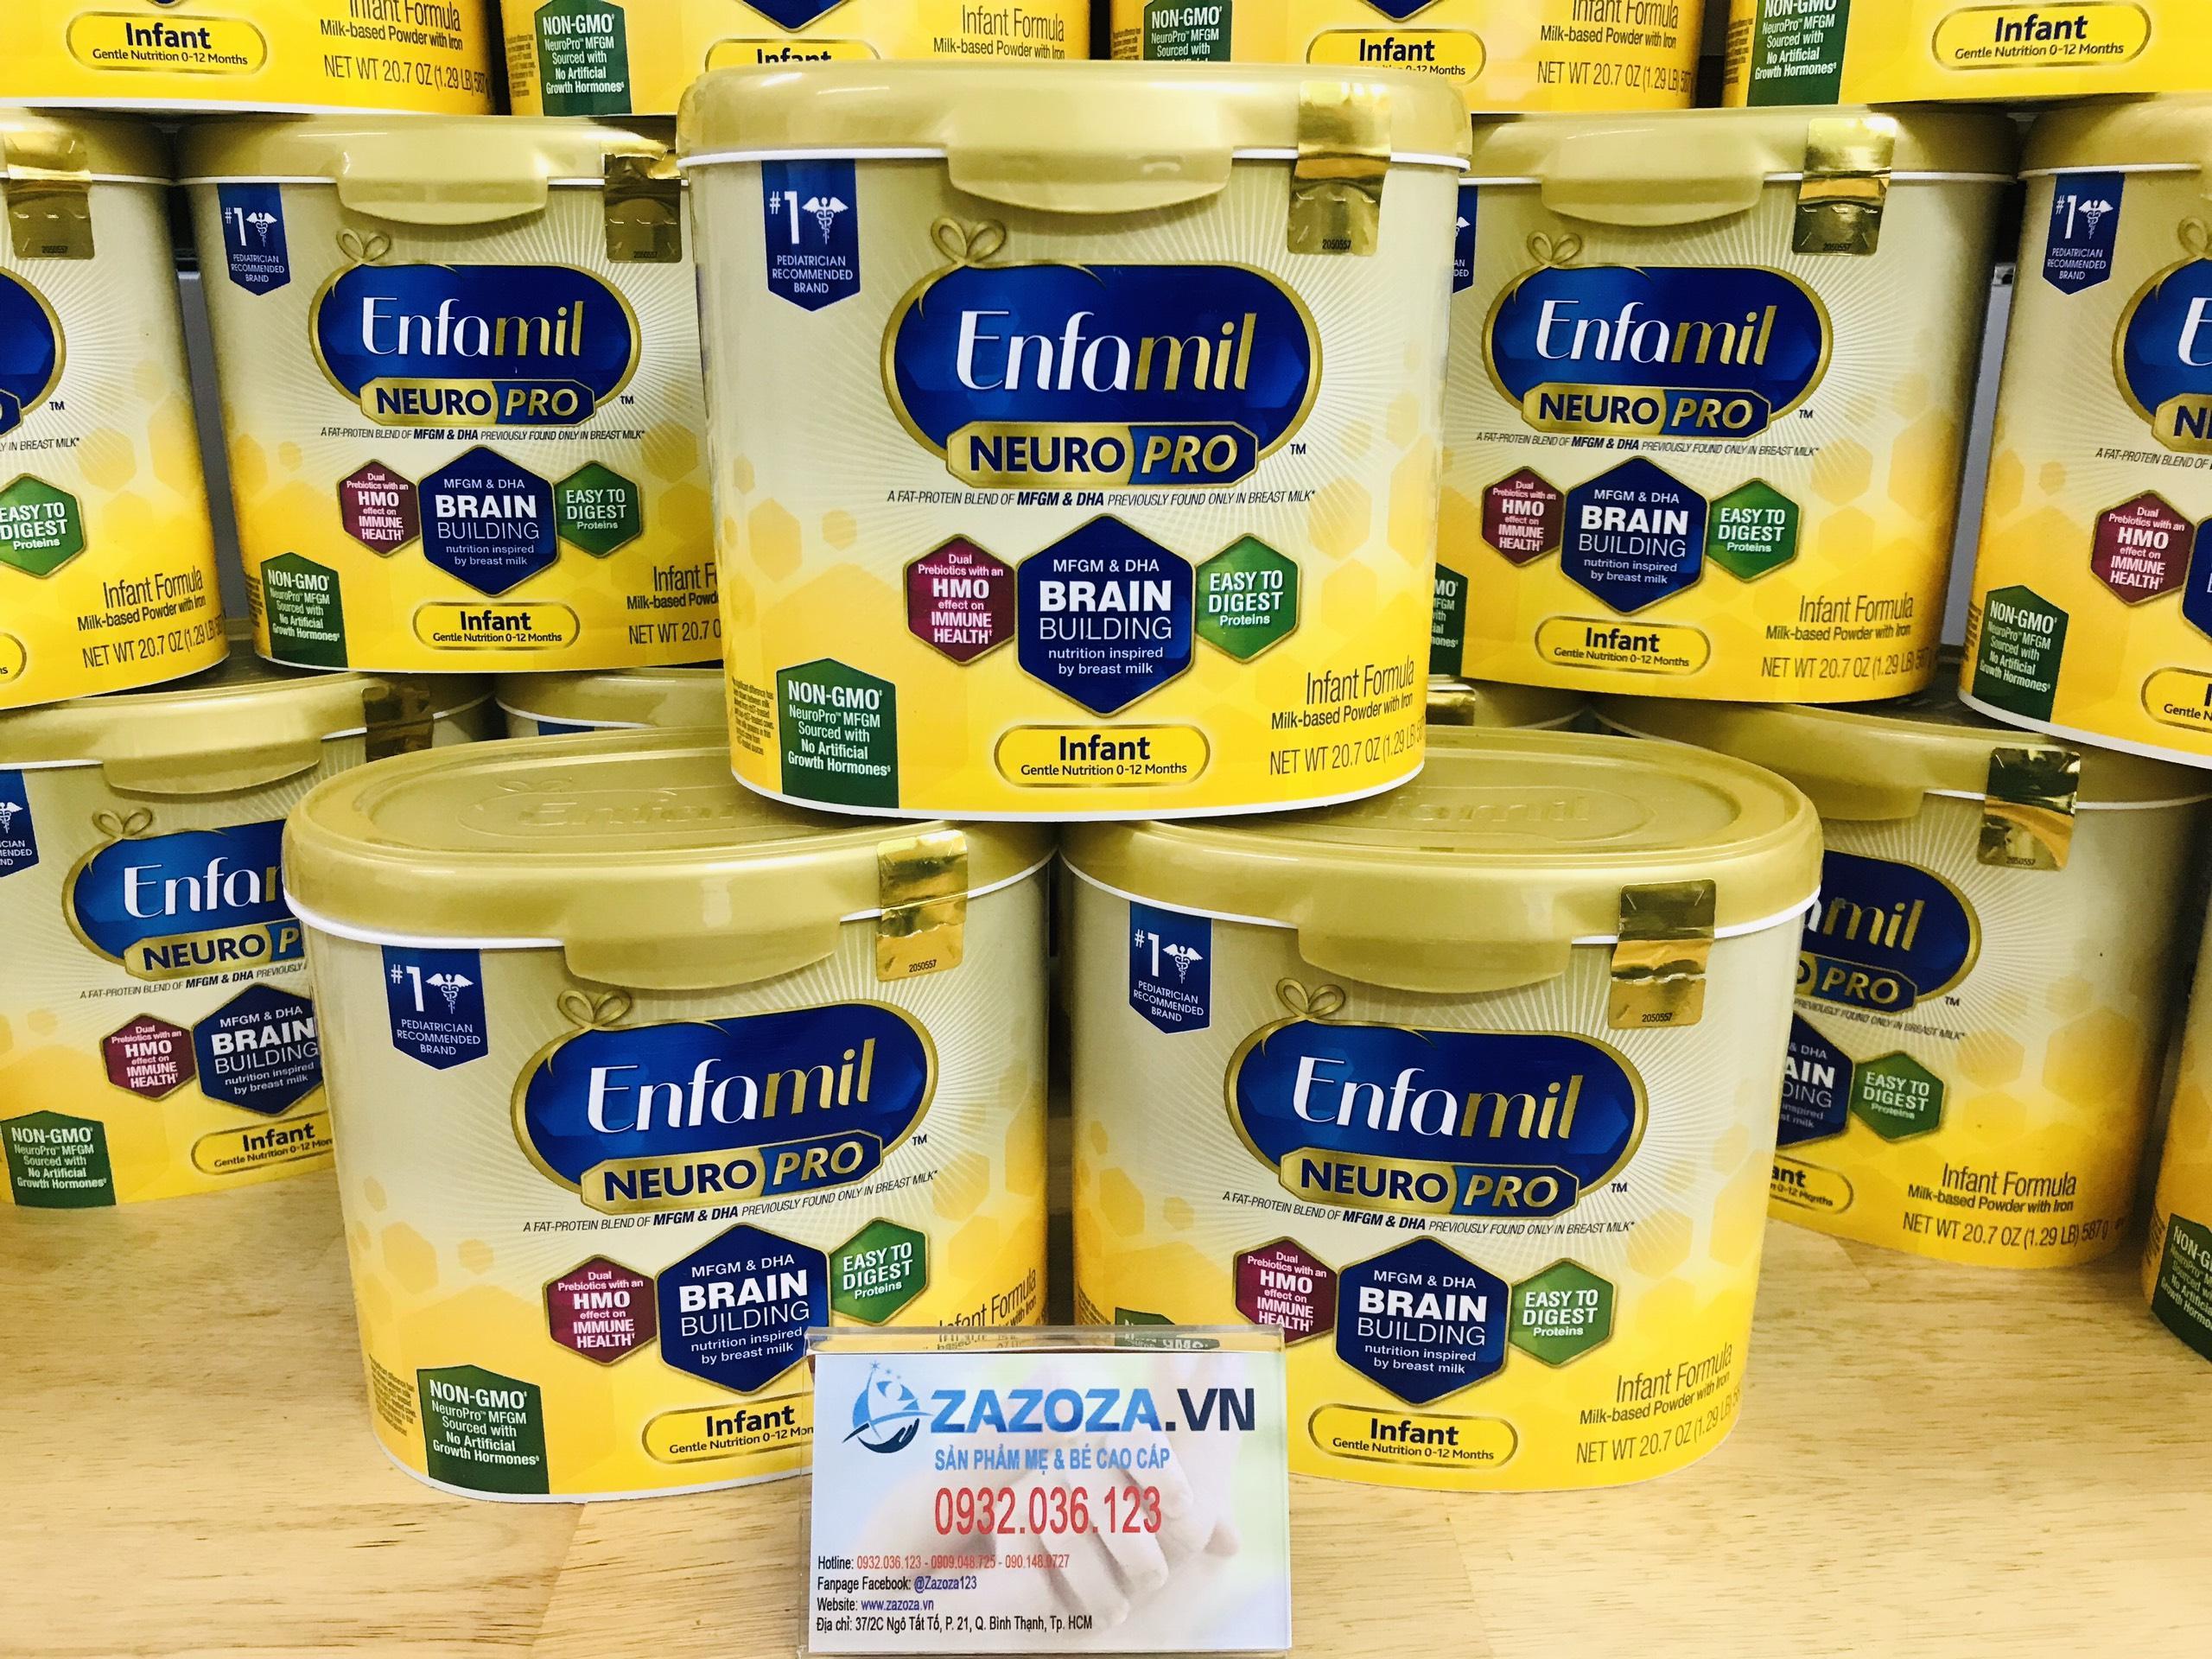 Sữa bột Enfamil Neuro Pro NON-GMO Infant Formula 587g nhập Mỹ